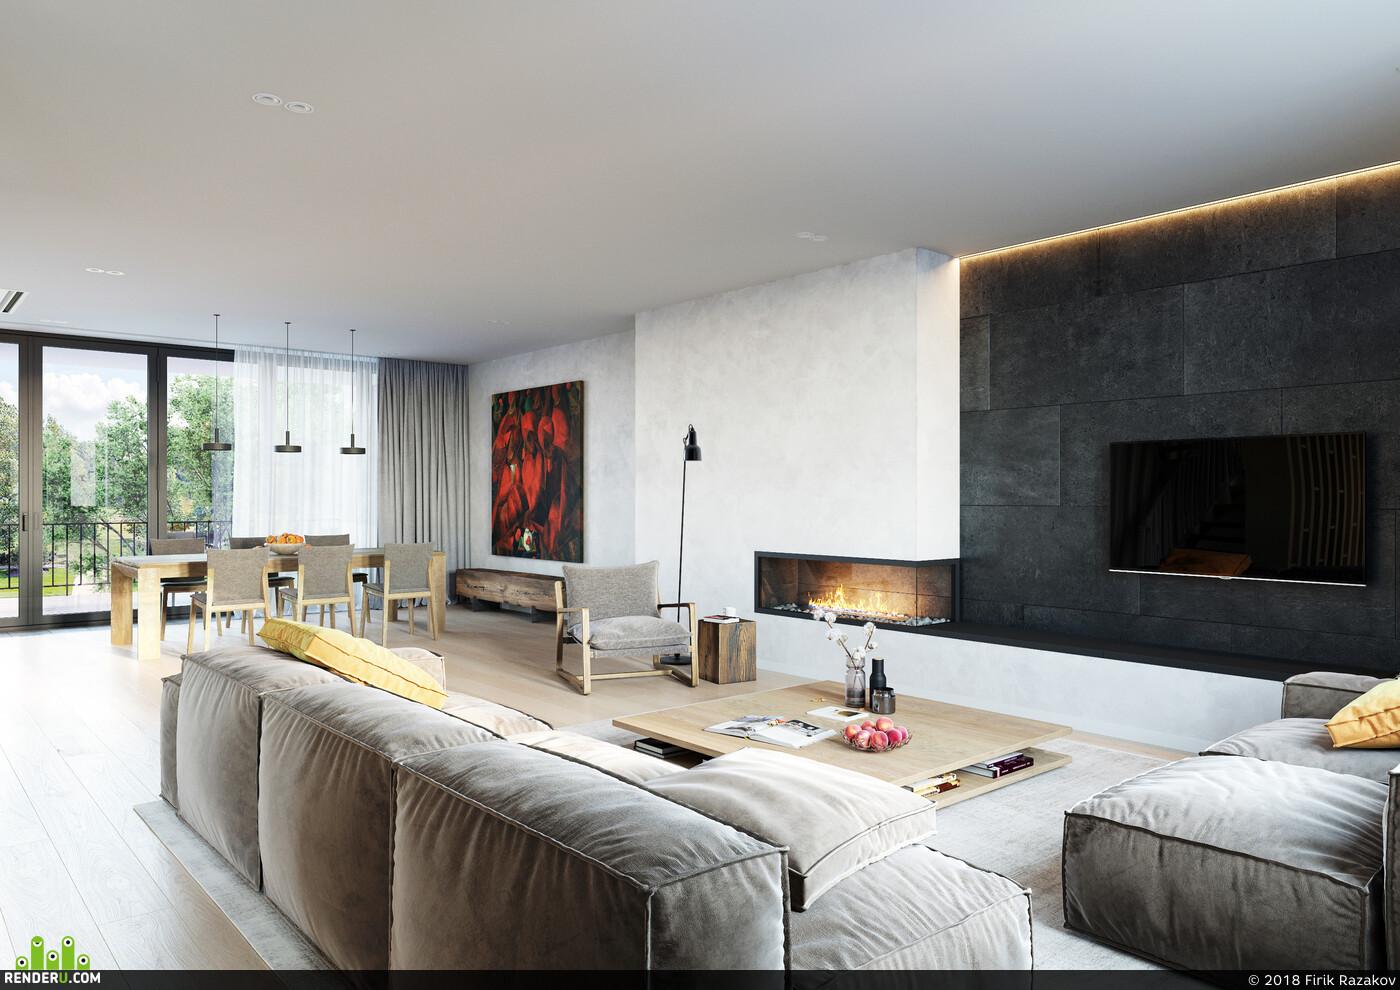 townhouse, cgi, Corona Renderer, visualization, livingroom, diningroom, kitchen, close up, камин, open space